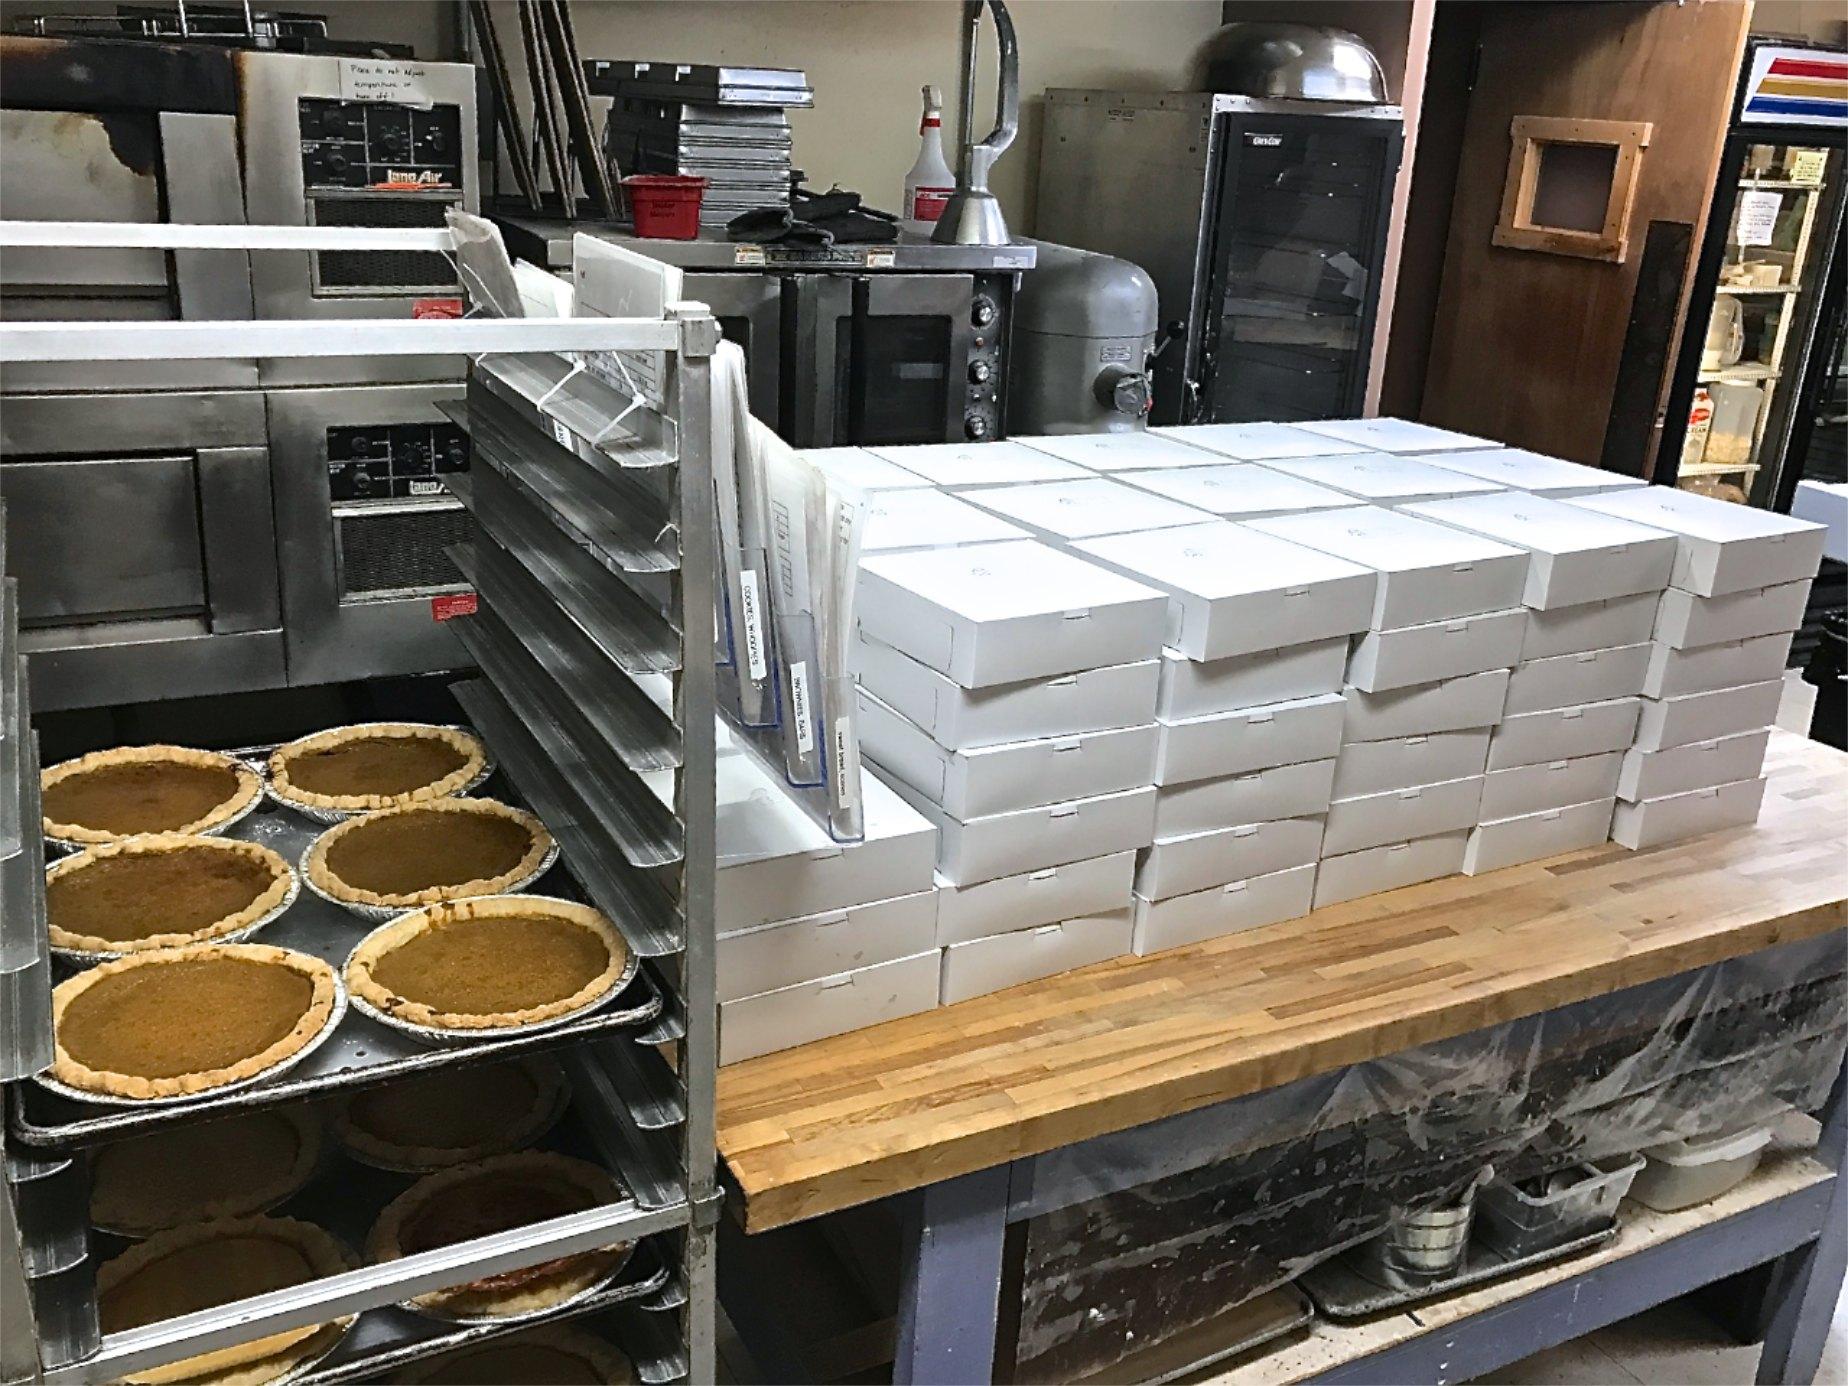 Neighbors Helping Neighbors holiday pie making marathon!